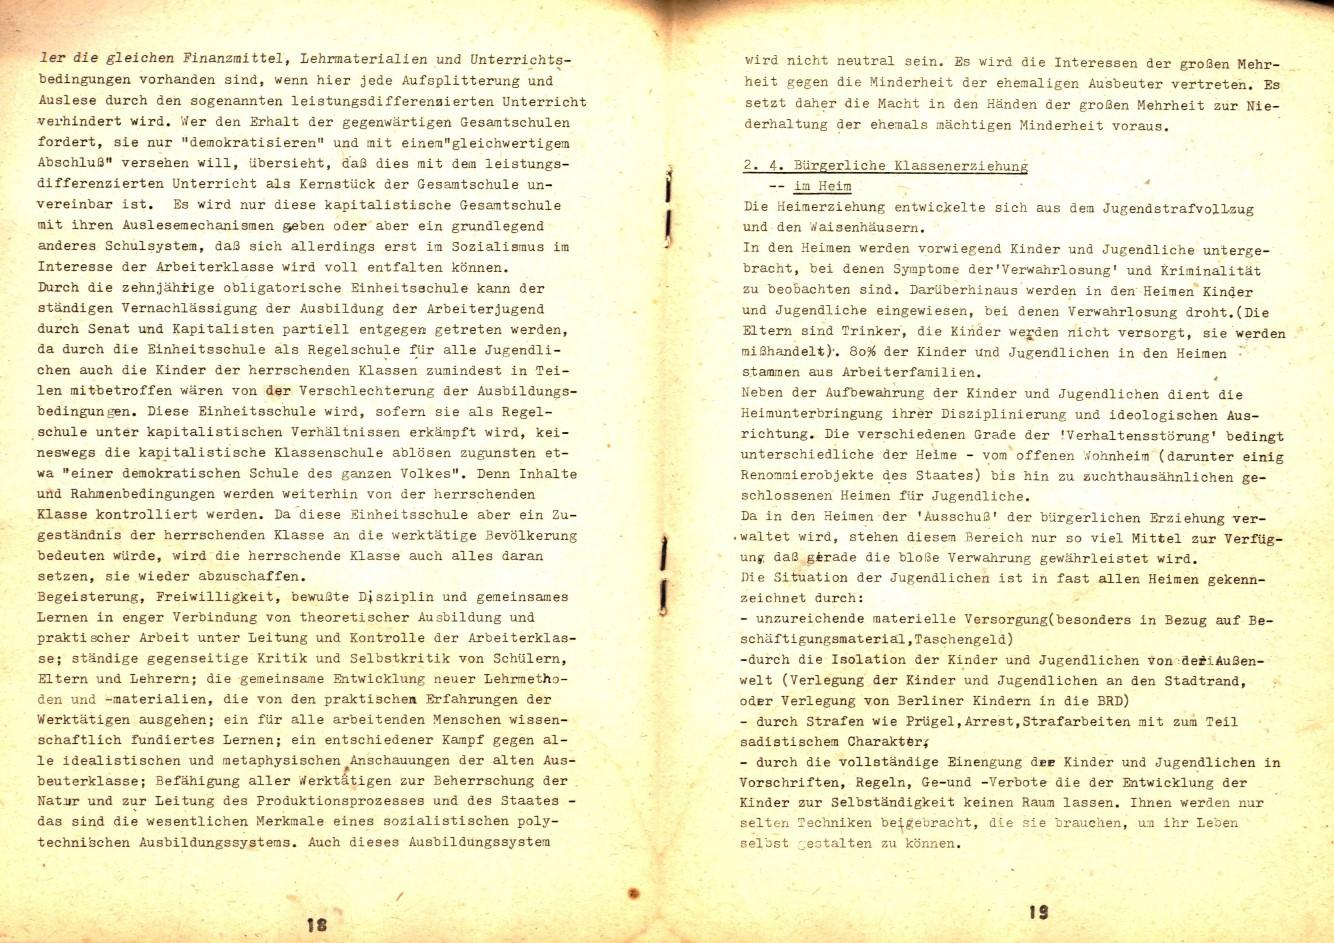 Berlin_BSLE_1975_Grundlagenpapier_11